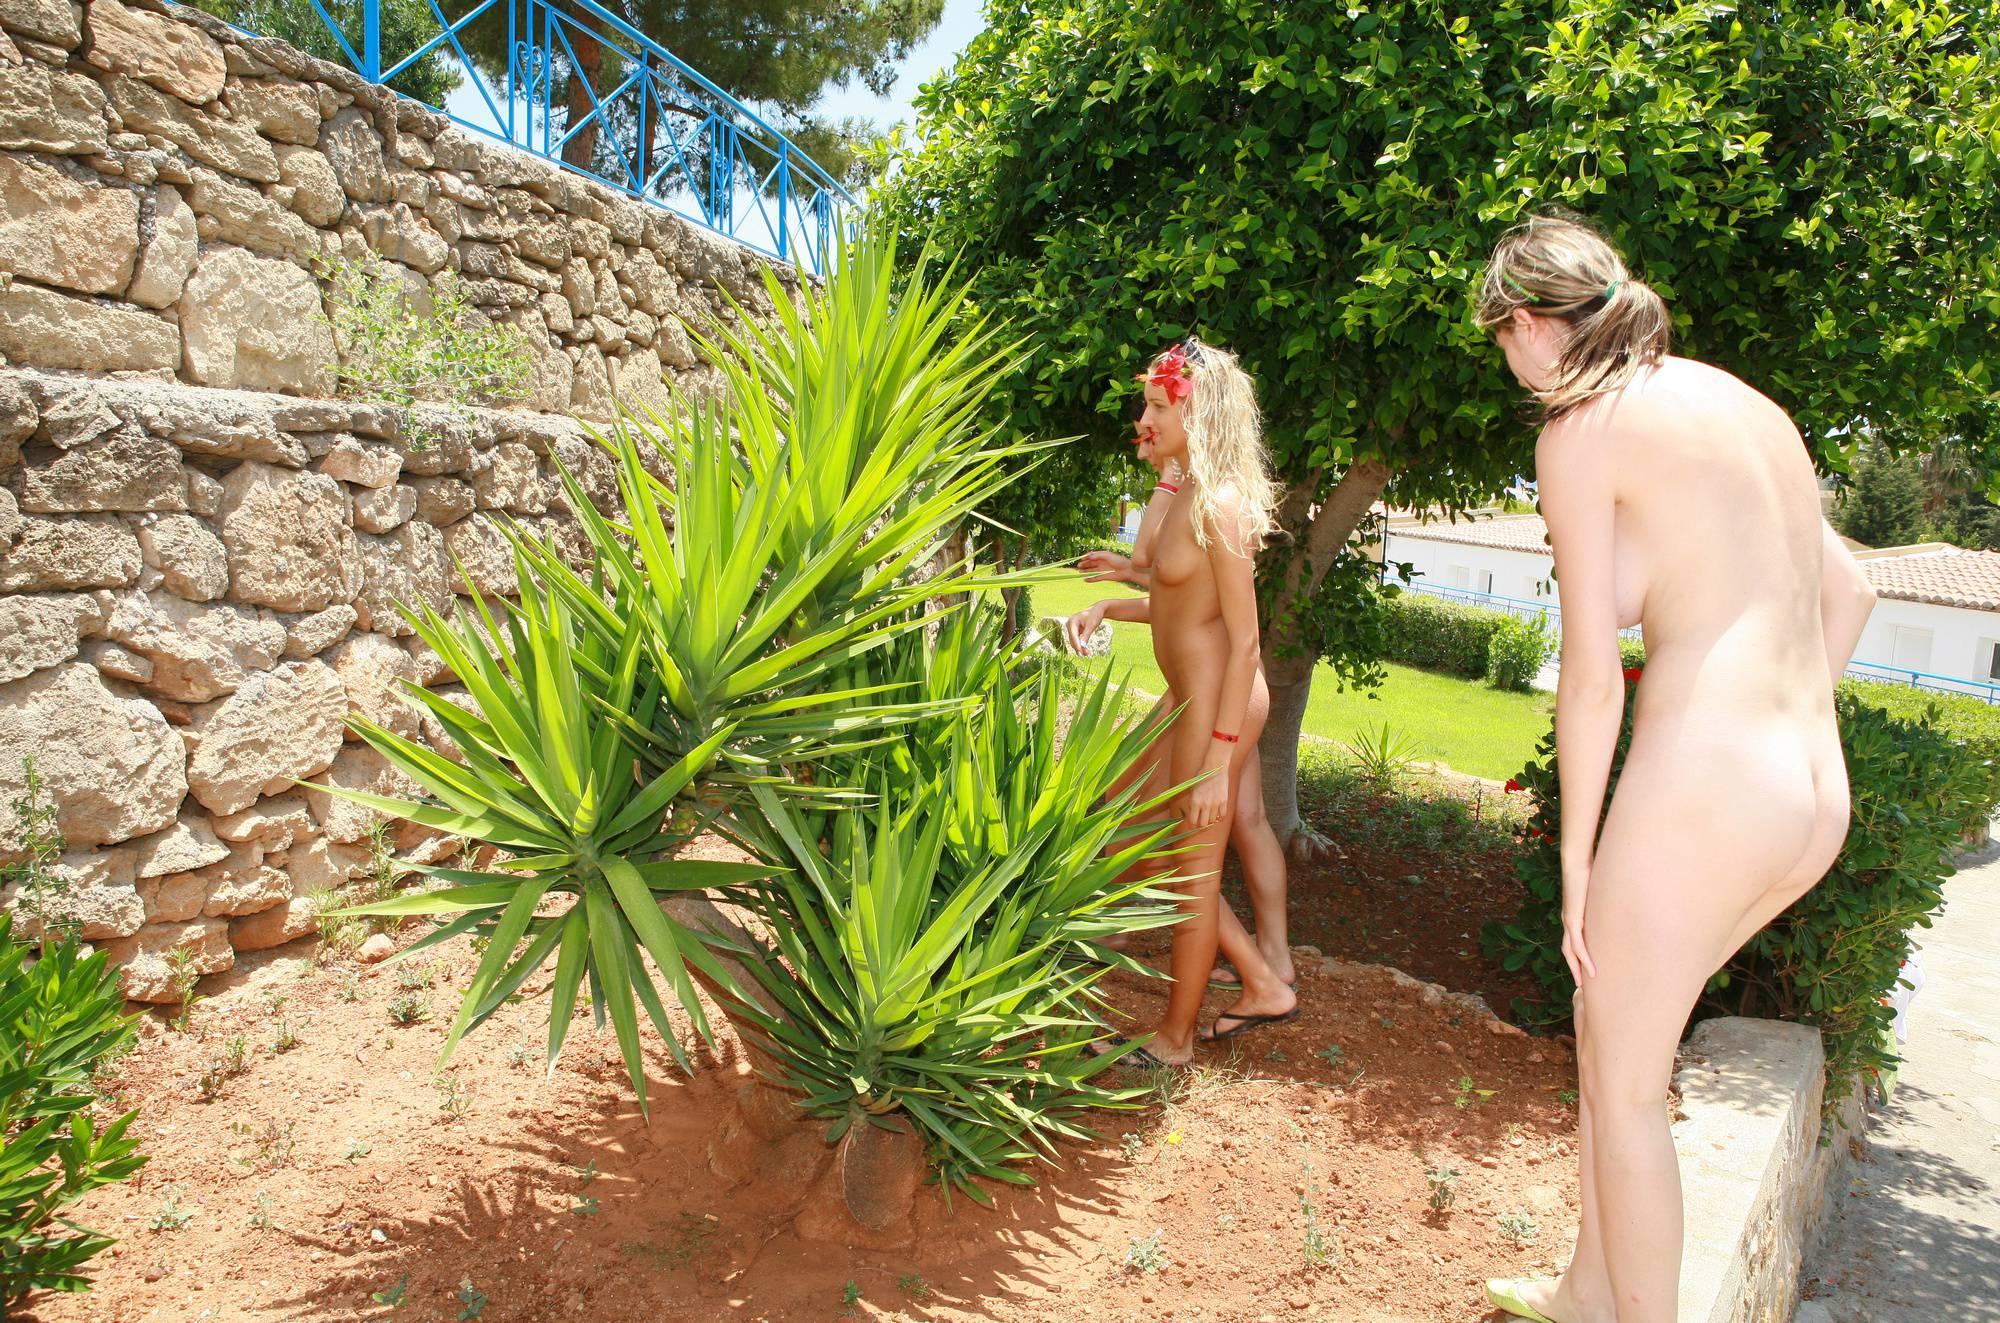 Nudist Photos Greek Palm Tree Paradise - 2